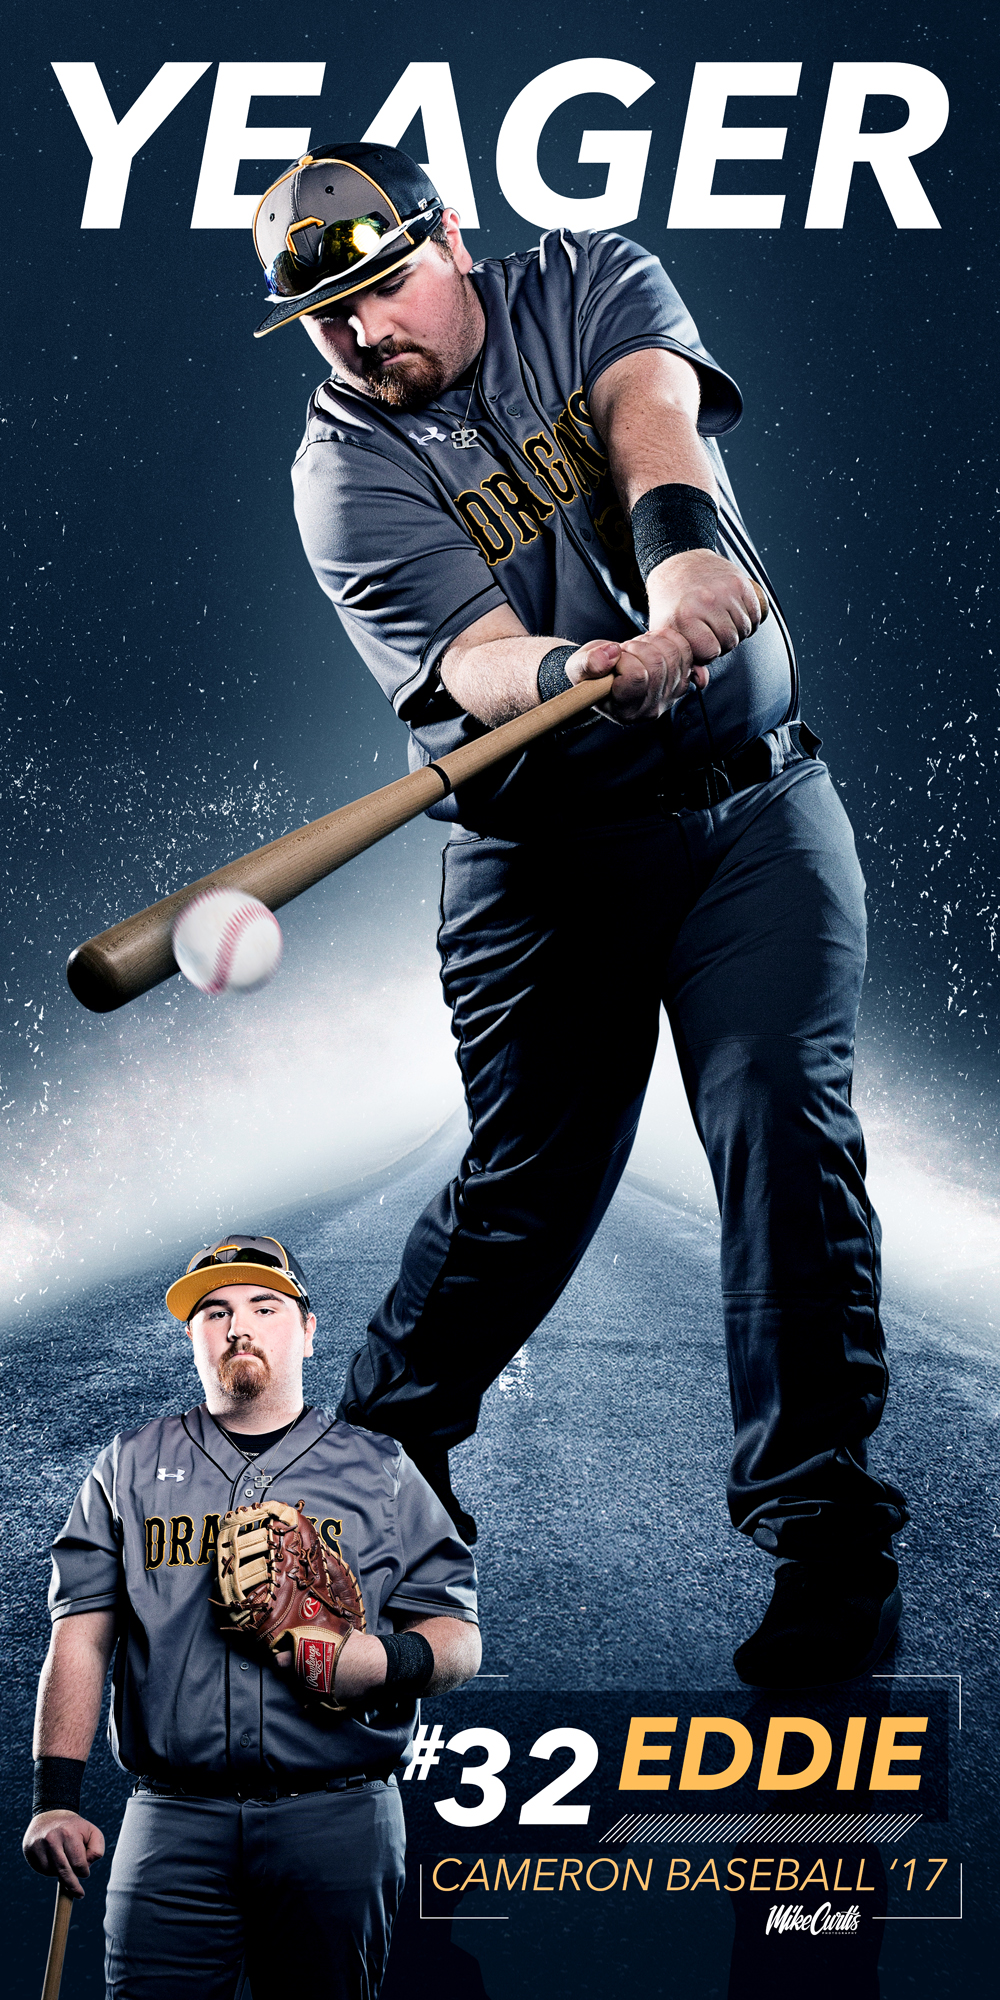 CHS-Baseball-17_Yeager_2x4-Banner.jpg